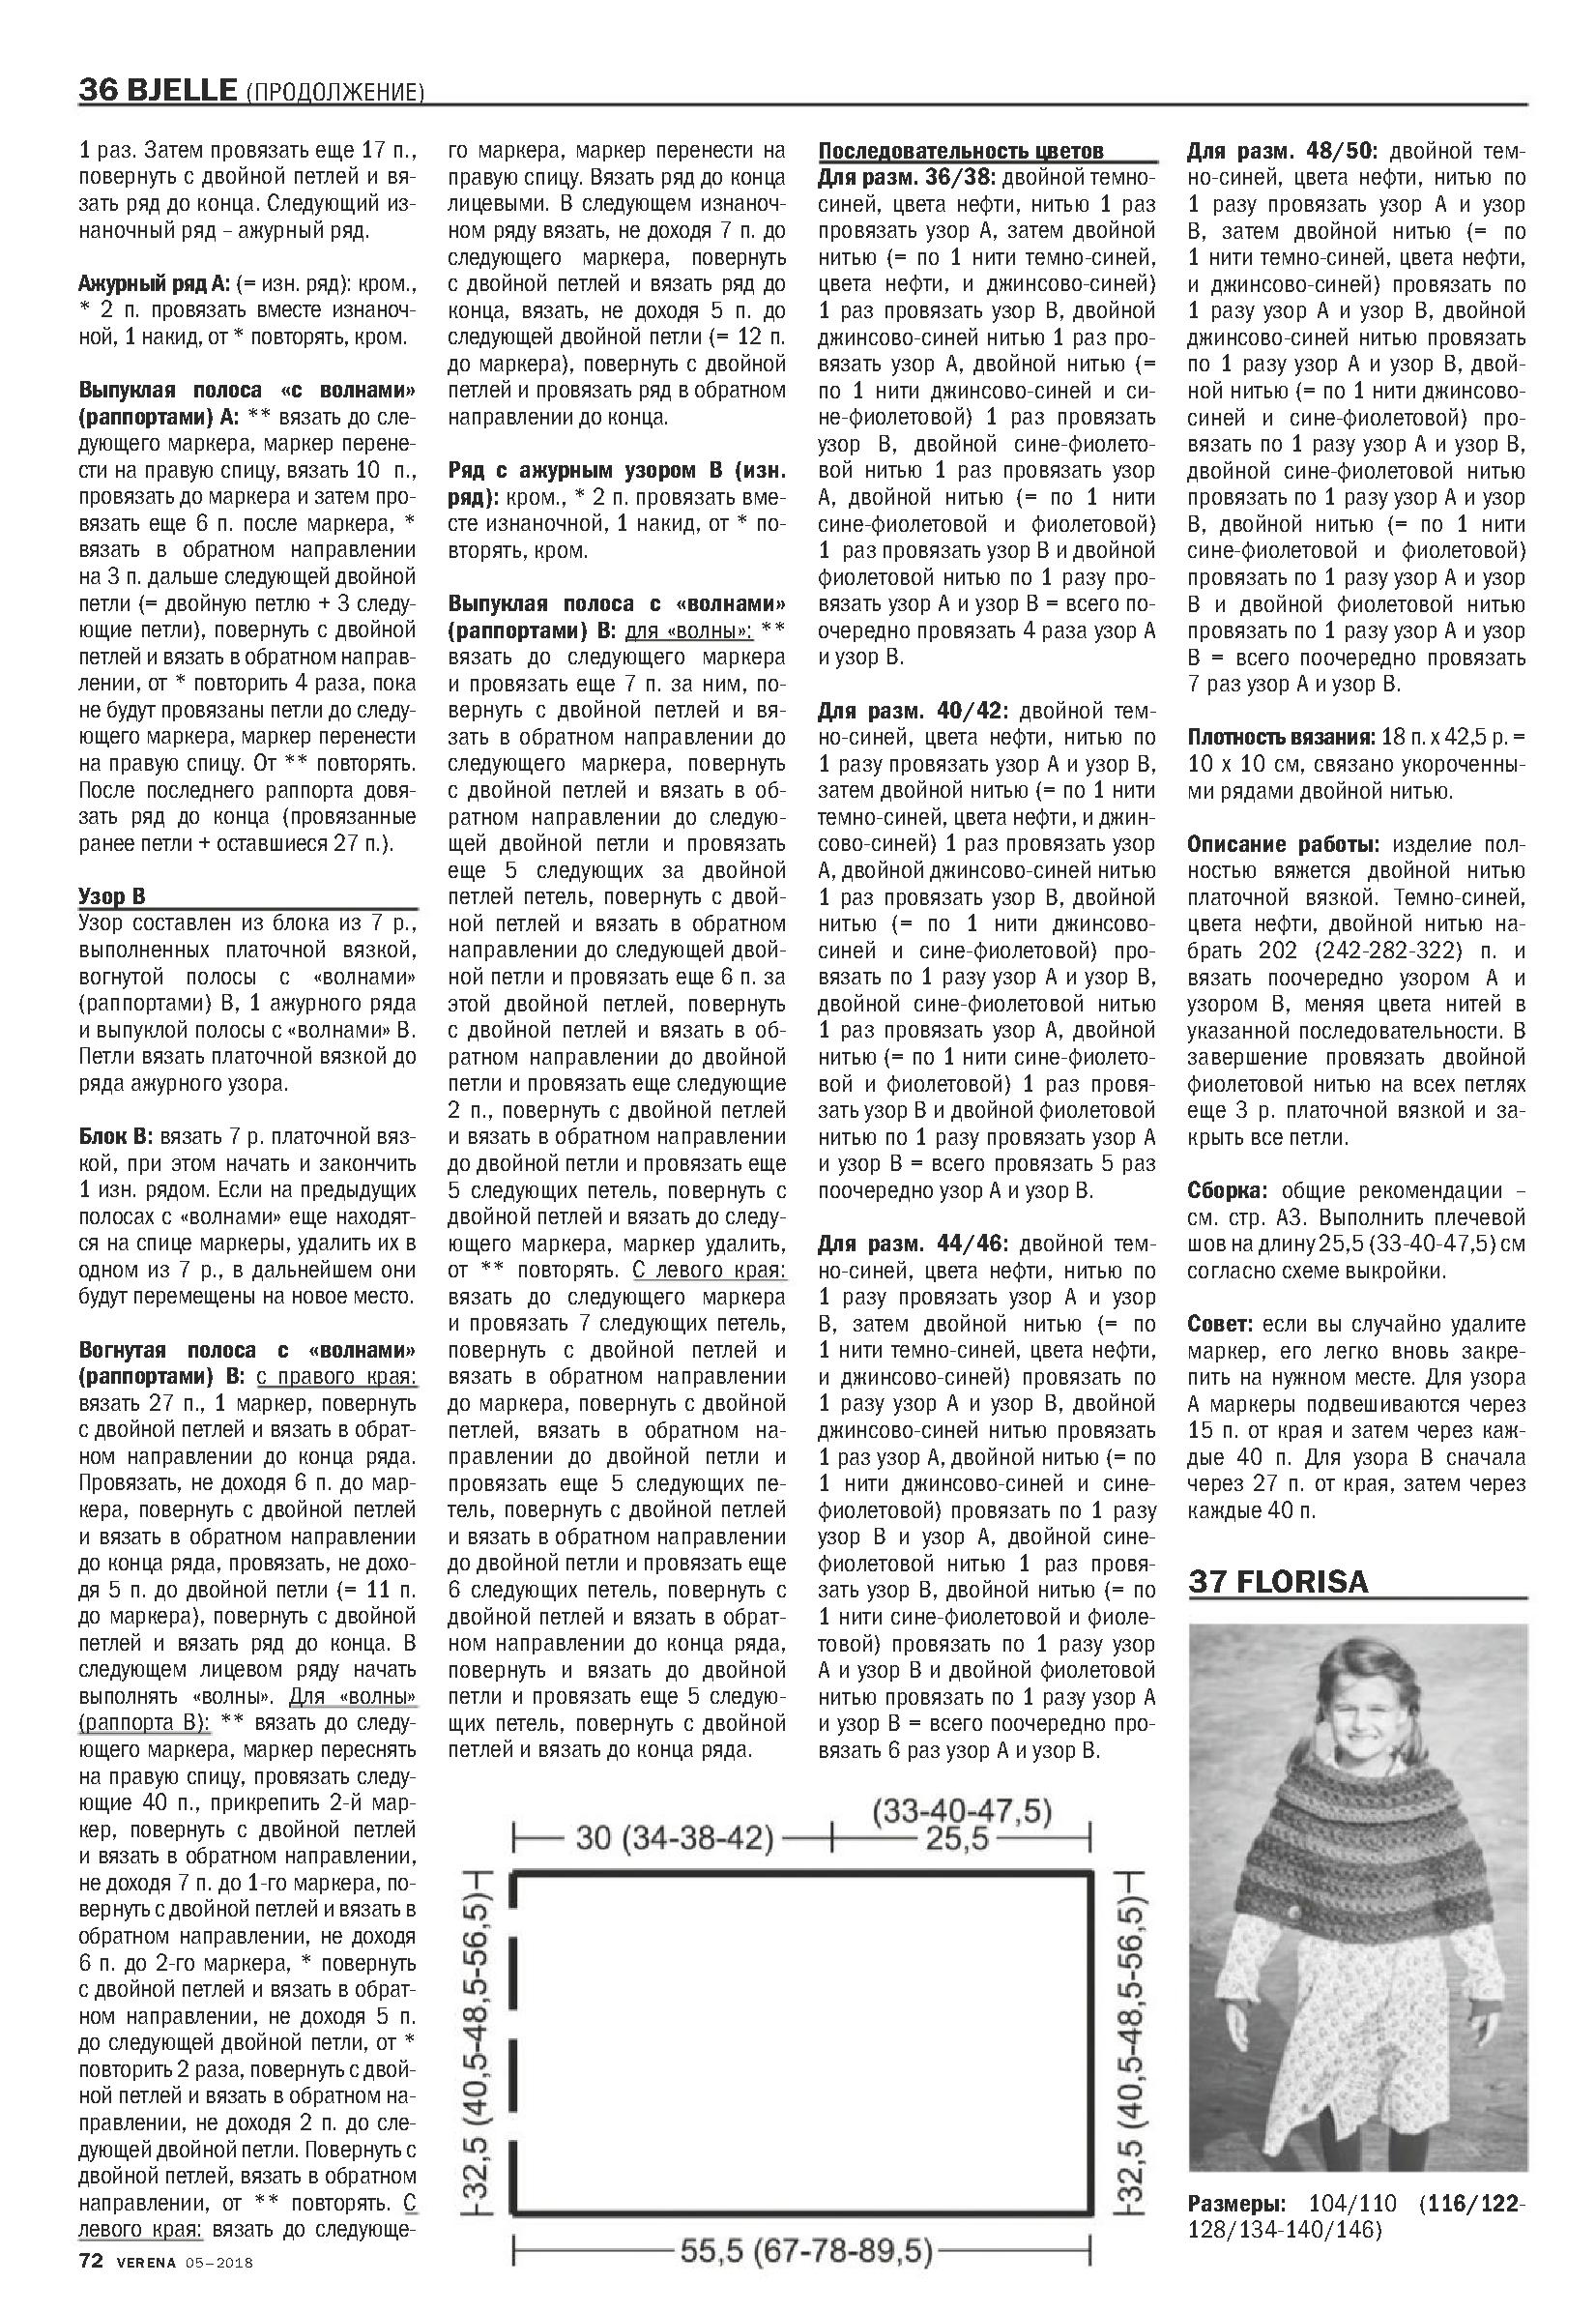 Page_00073.jpg